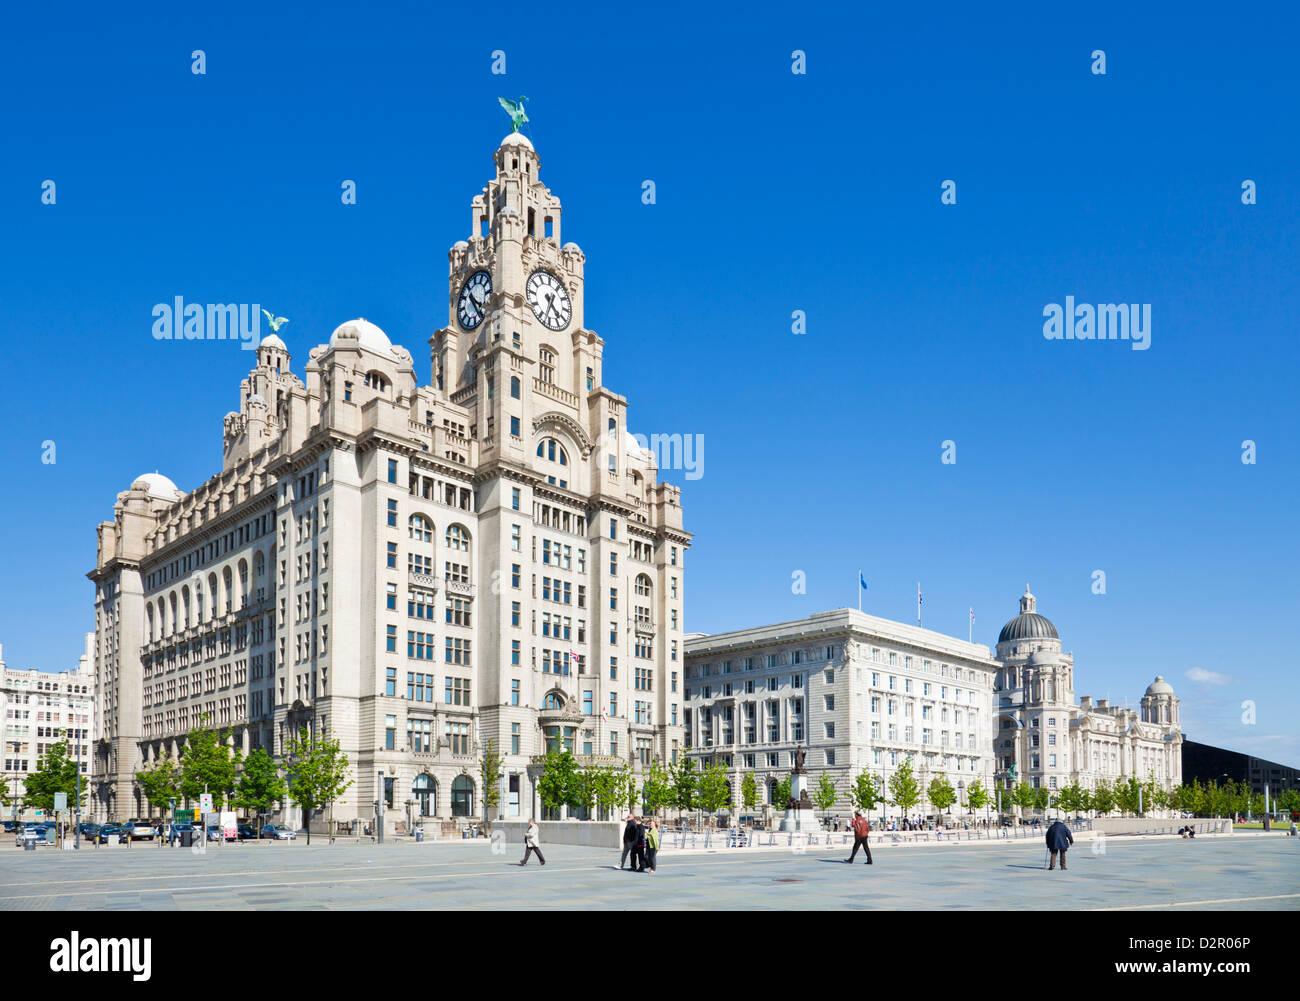 Trois Grâces bâtiments, Pierhead, front de Liverpool, Liverpool, Merseyside, England, UK Photo Stock